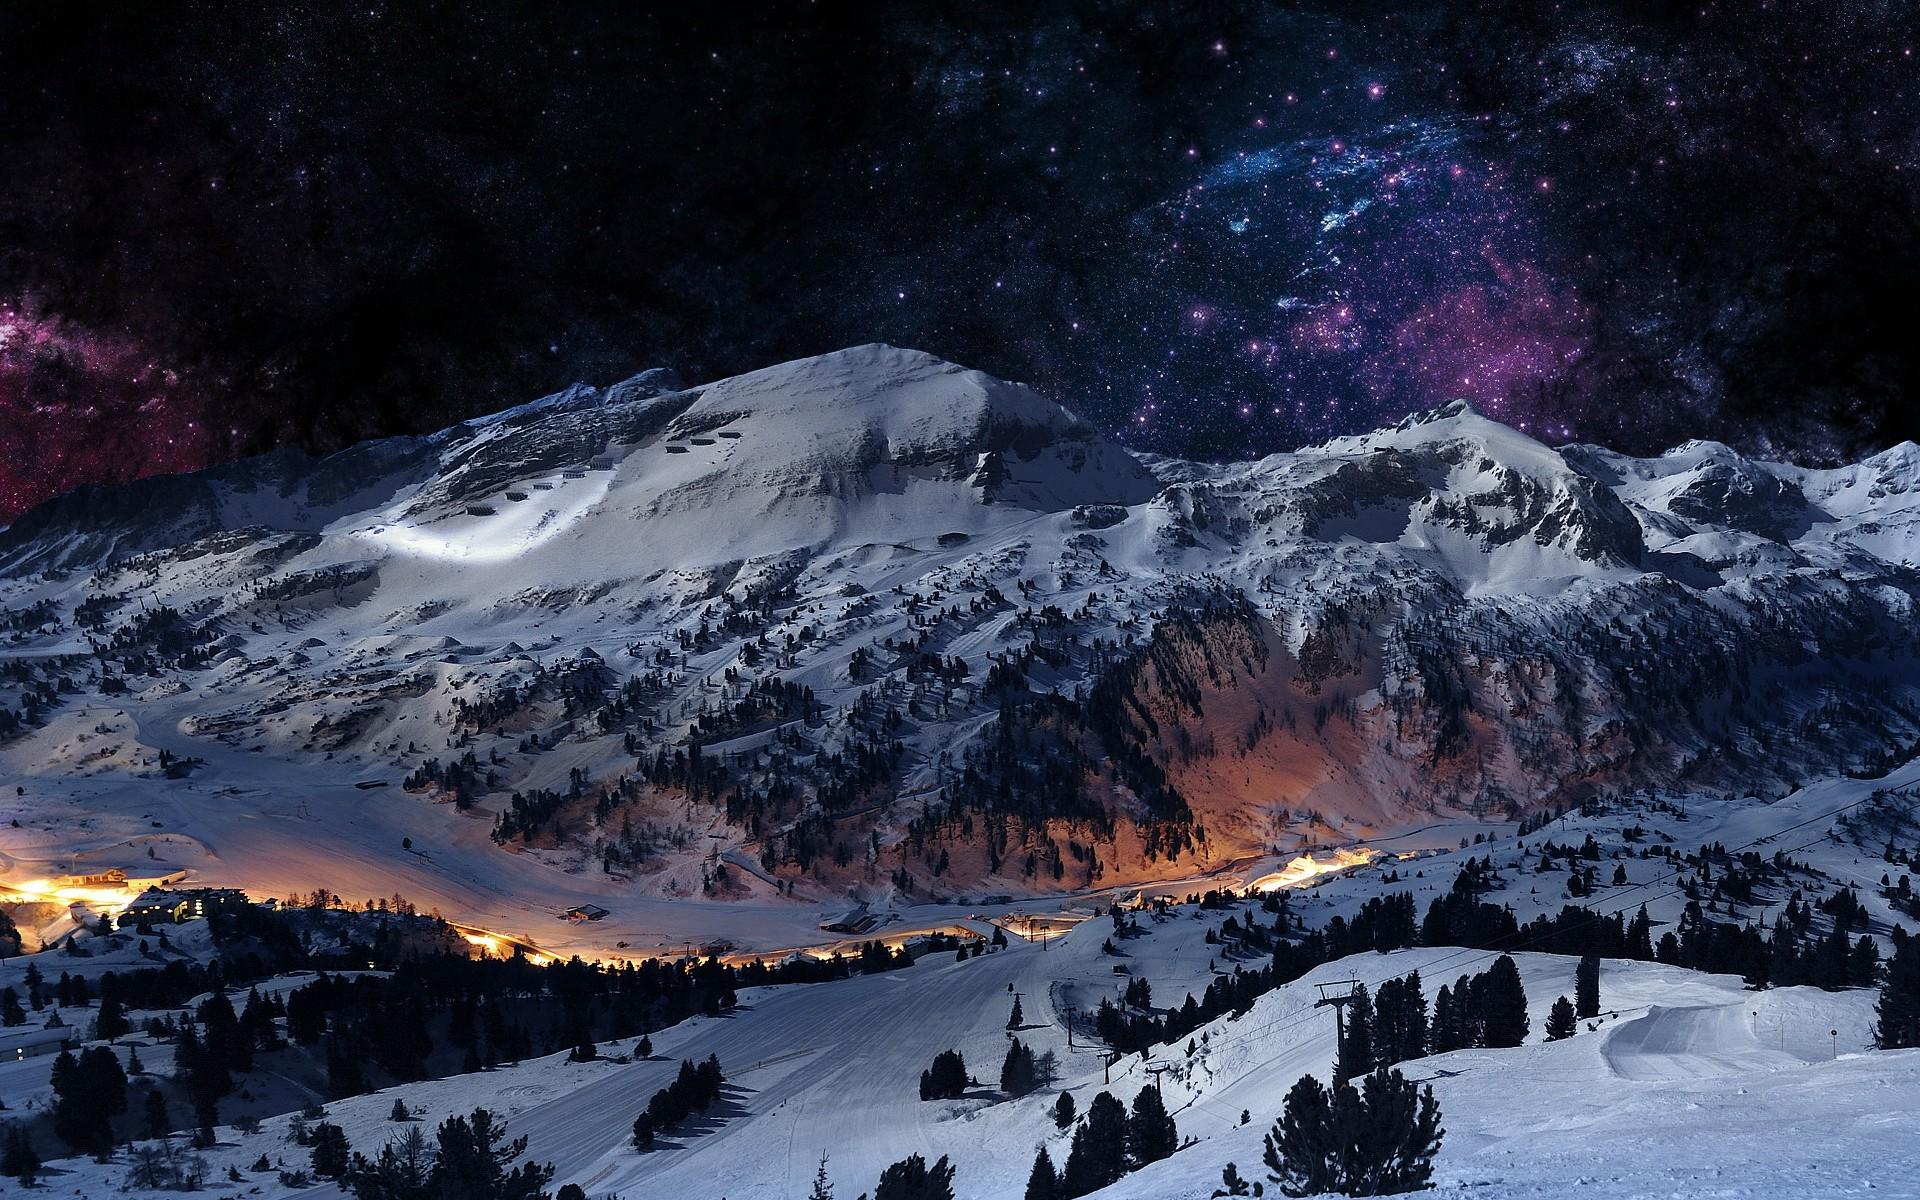 Wallpapers mountains landscapes winter digital art scene night 1920x1200